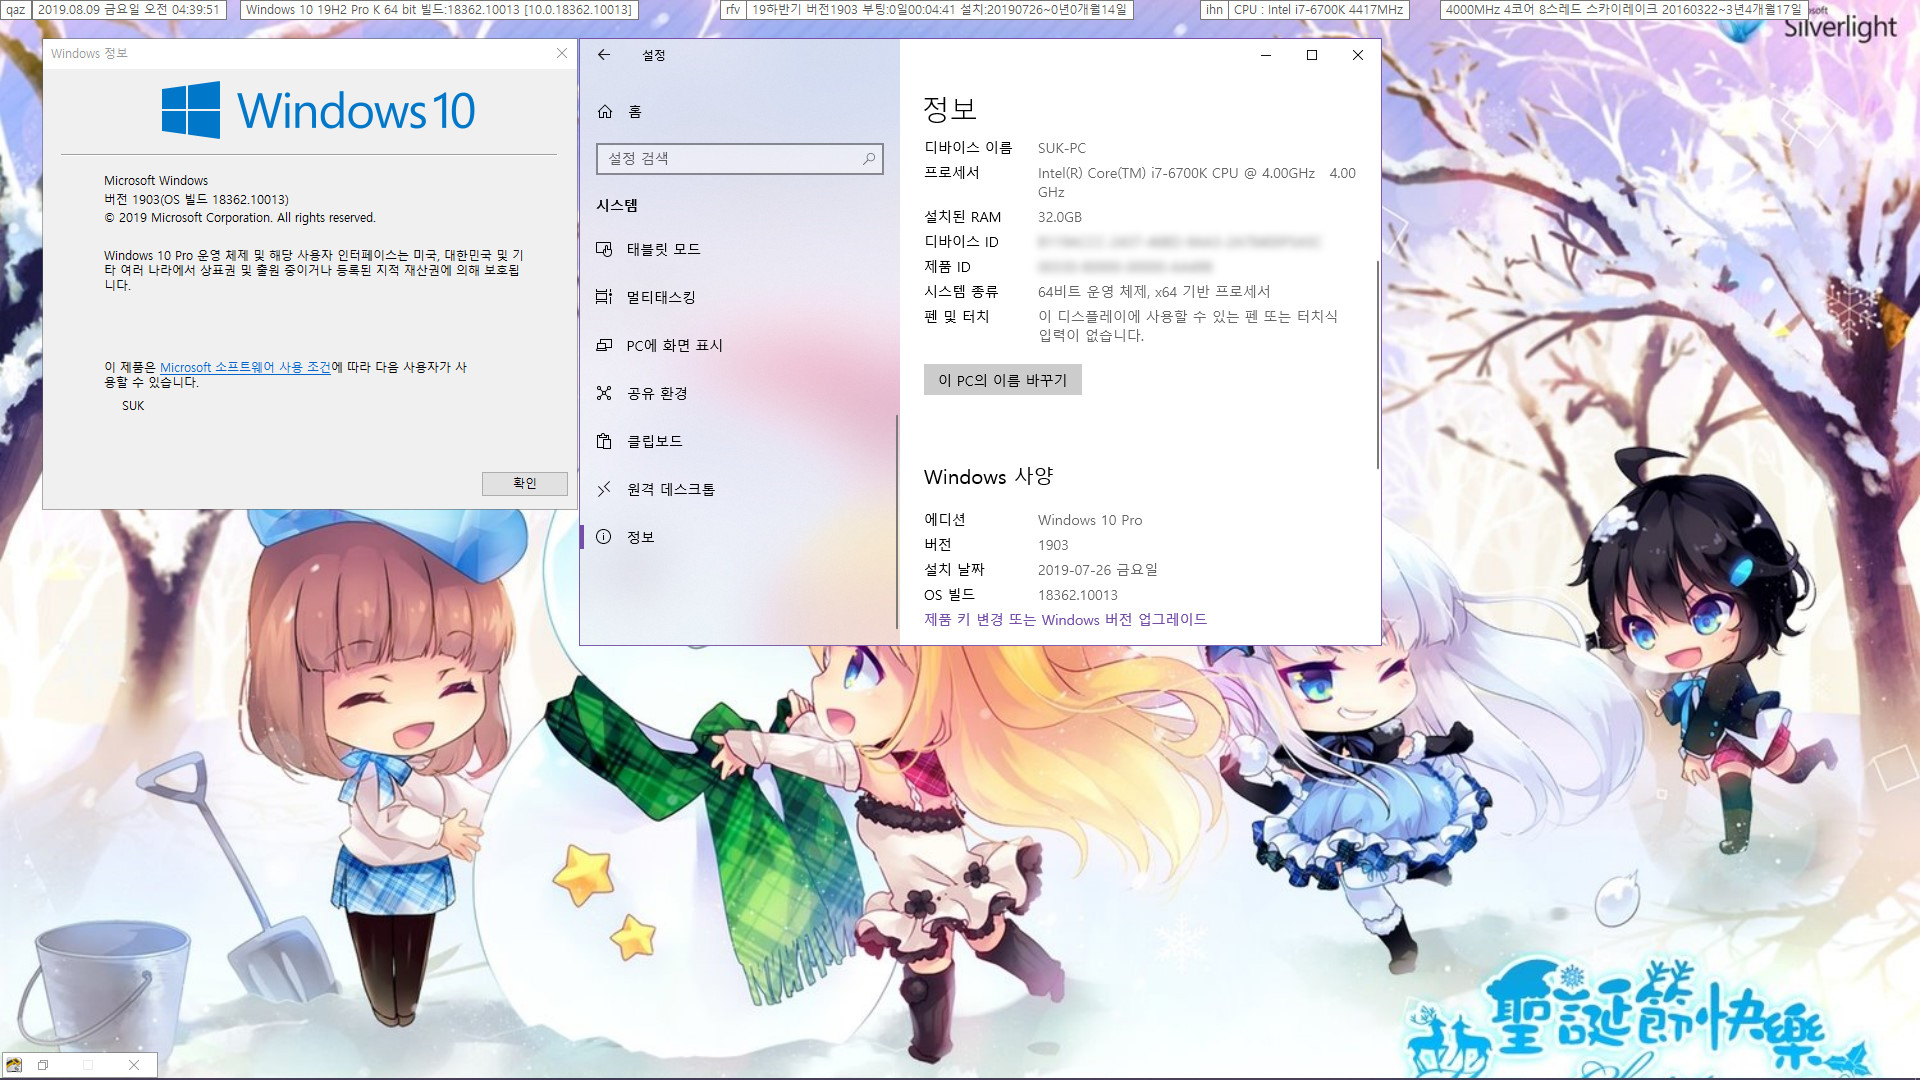 Windows 10 19H2 인사이더 프리뷰 KB4508451 누적 업데이트 (OS 빌드 18362.10013) [2019-08-08 일자] 나왔네요 - KB숫자는 계속 같습니다 - 실컴에 설치합니다 - 완료 2019-08-09_043952.jpg